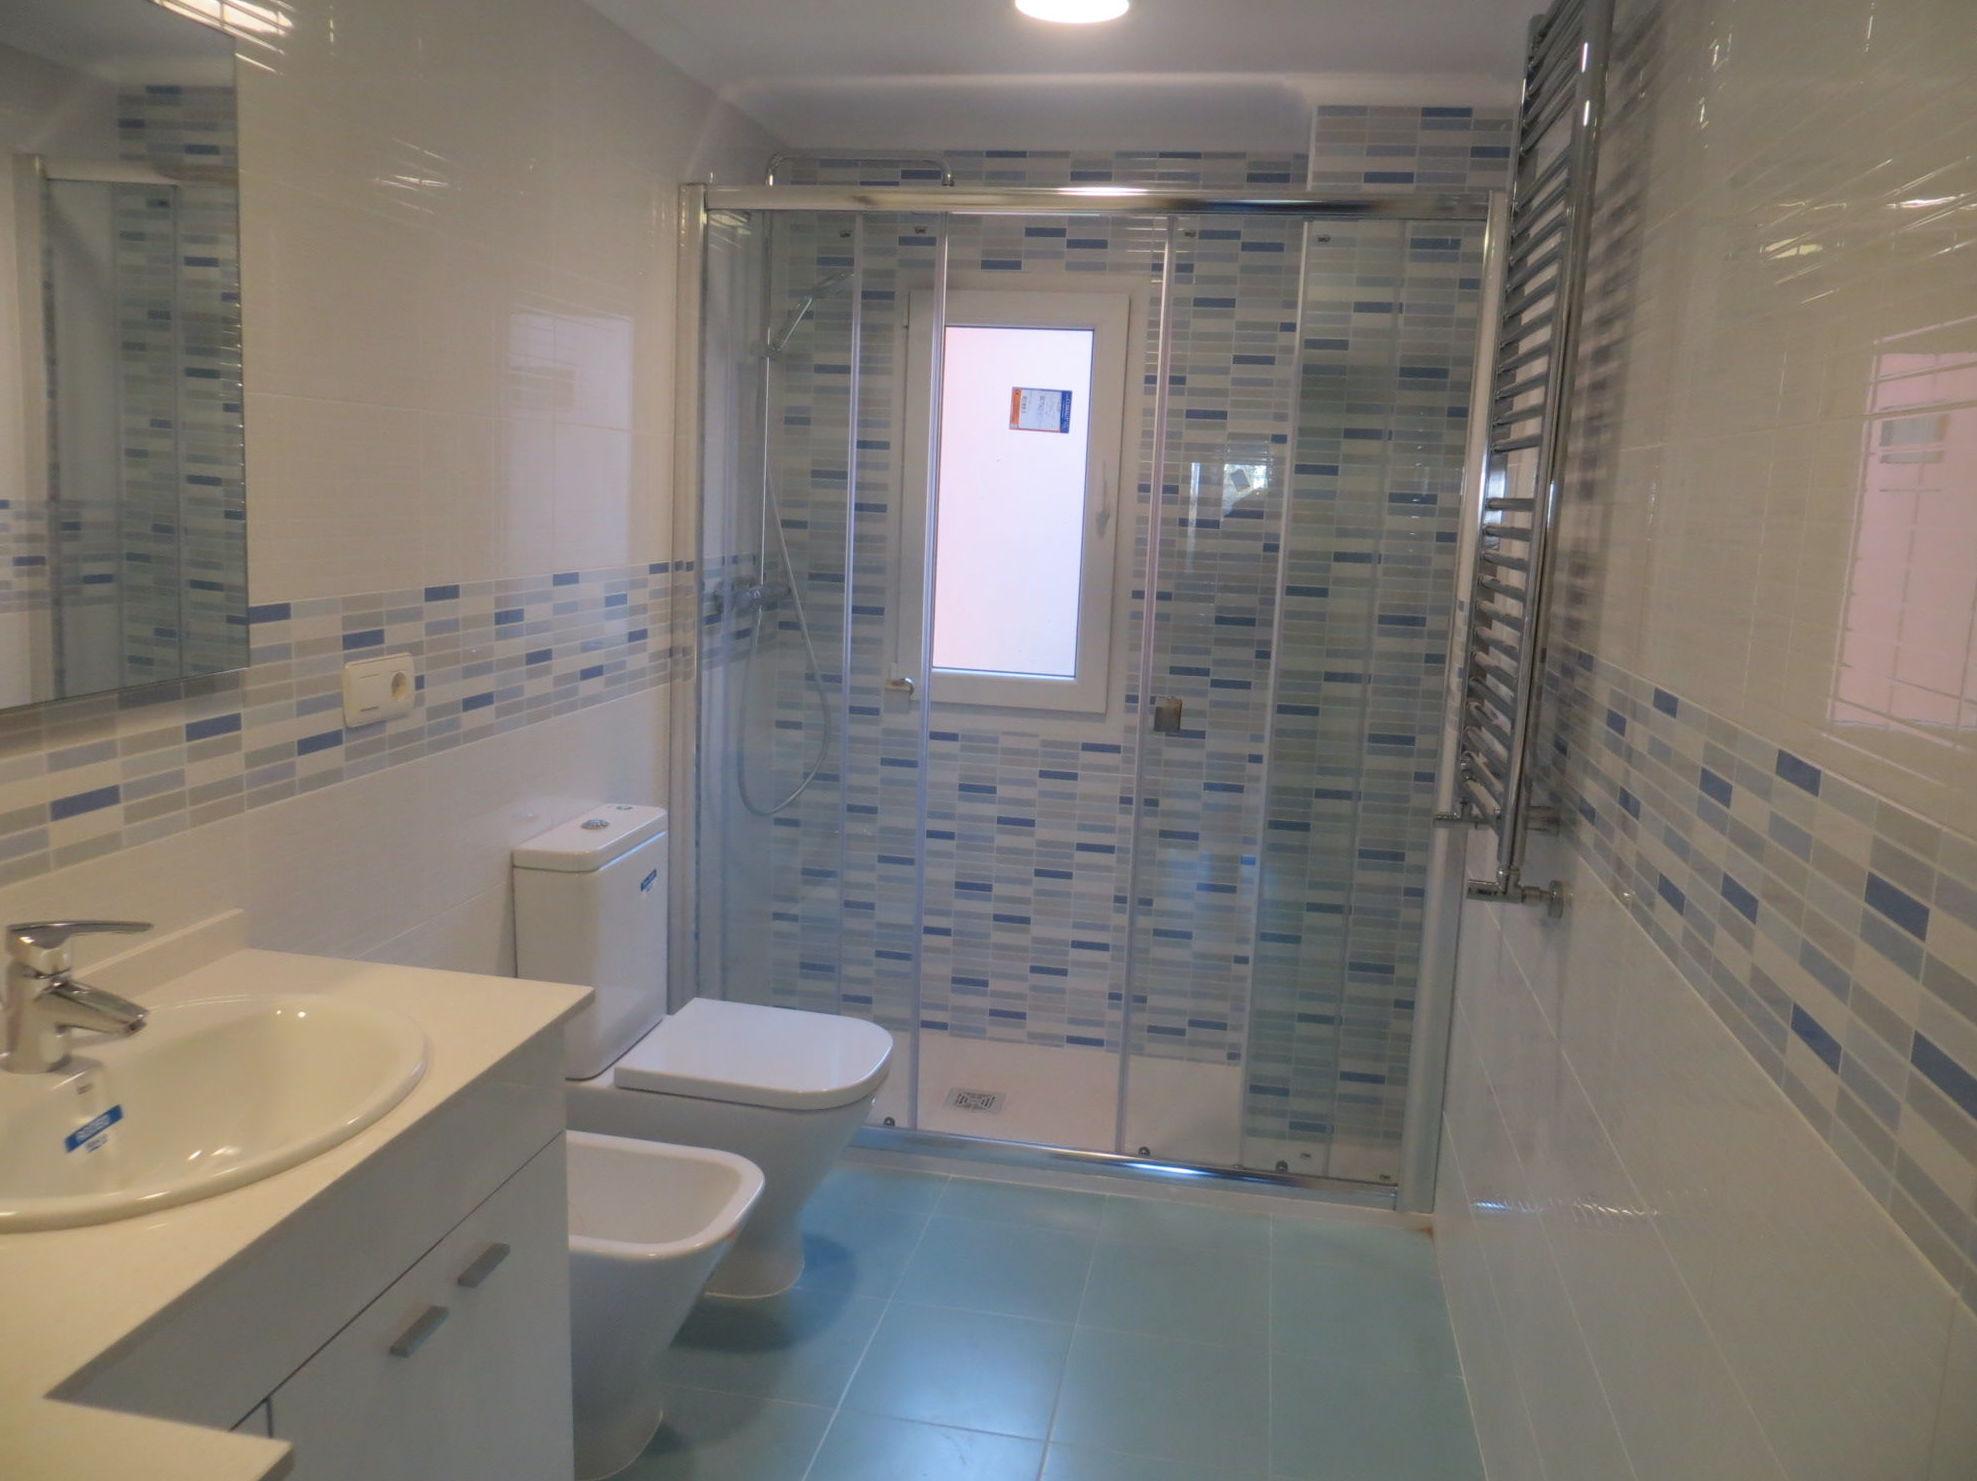 Baño realizado por Gresastur en Gijón, Asturias